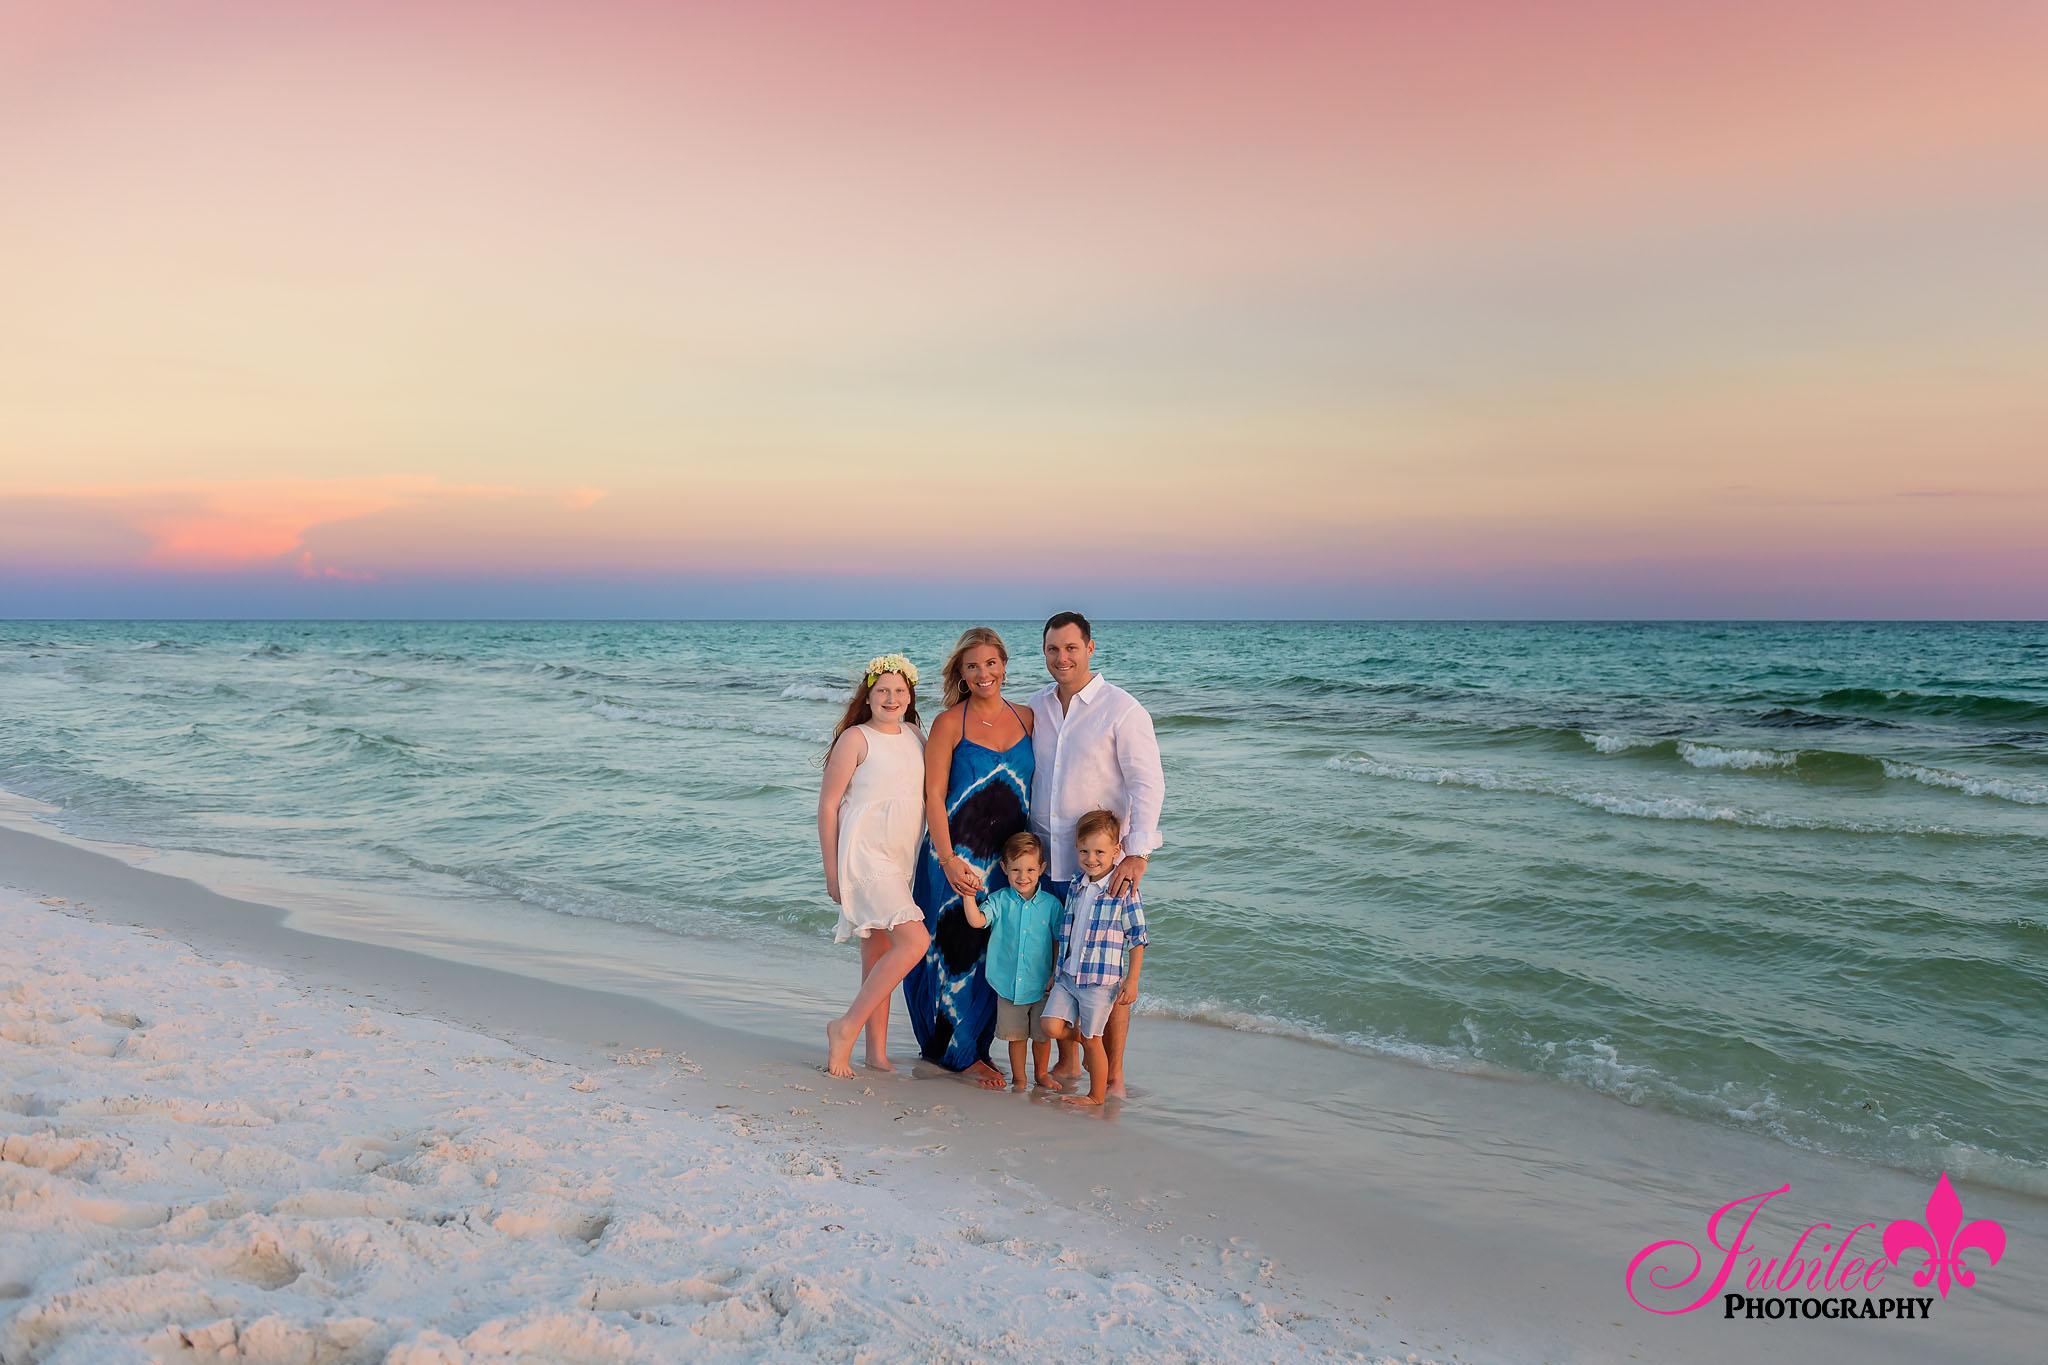 destin_beach_photographer_613